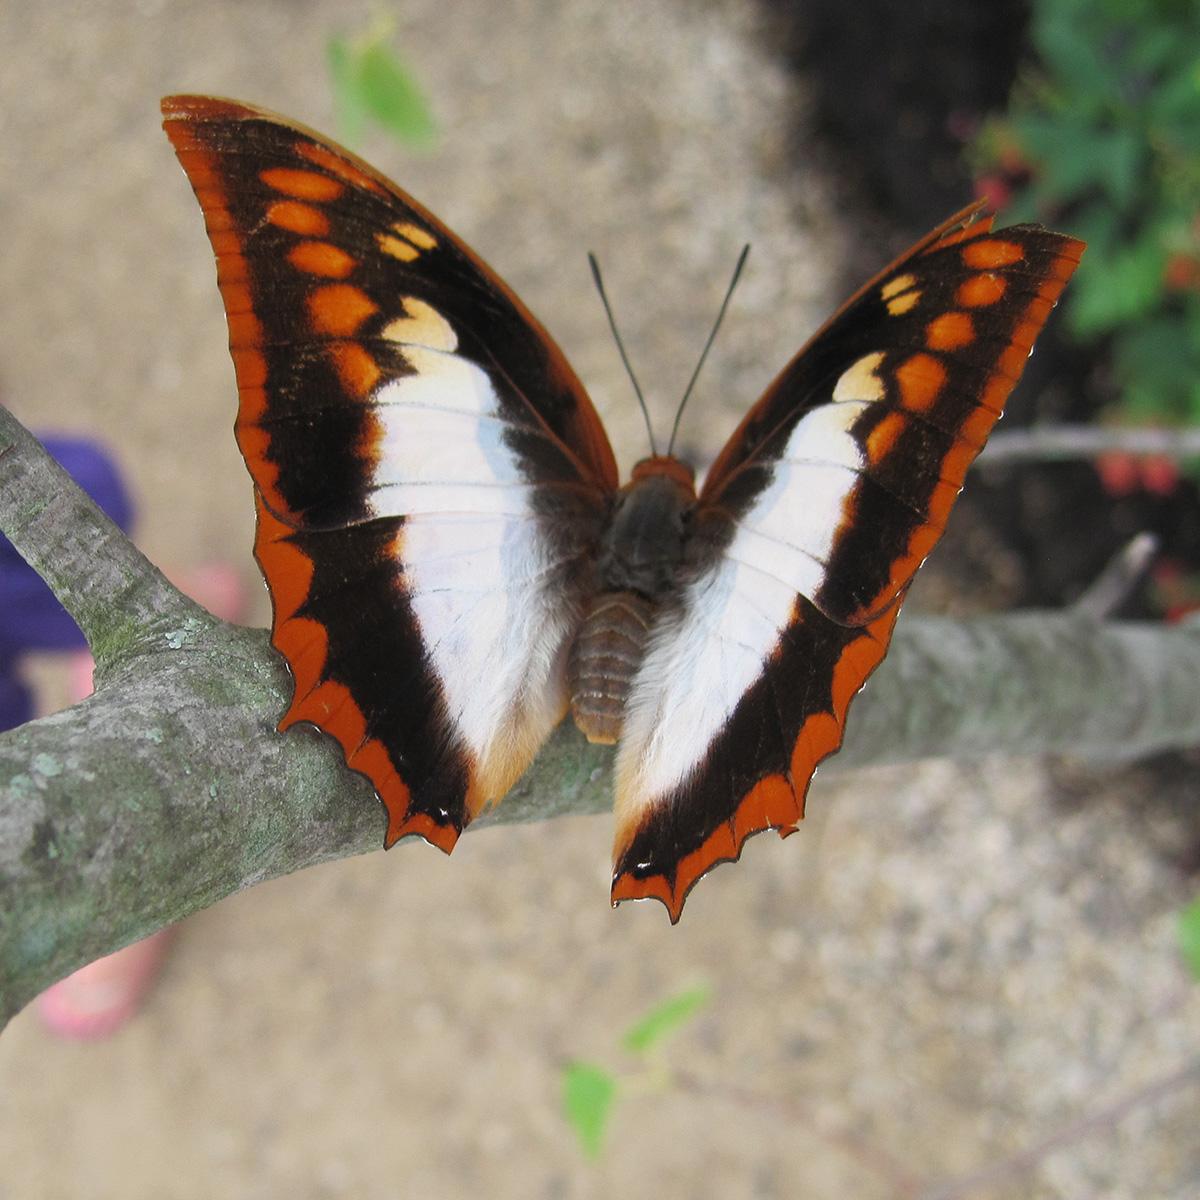 Speaking of Lepidoptera: Understanding butterfly vocabulary